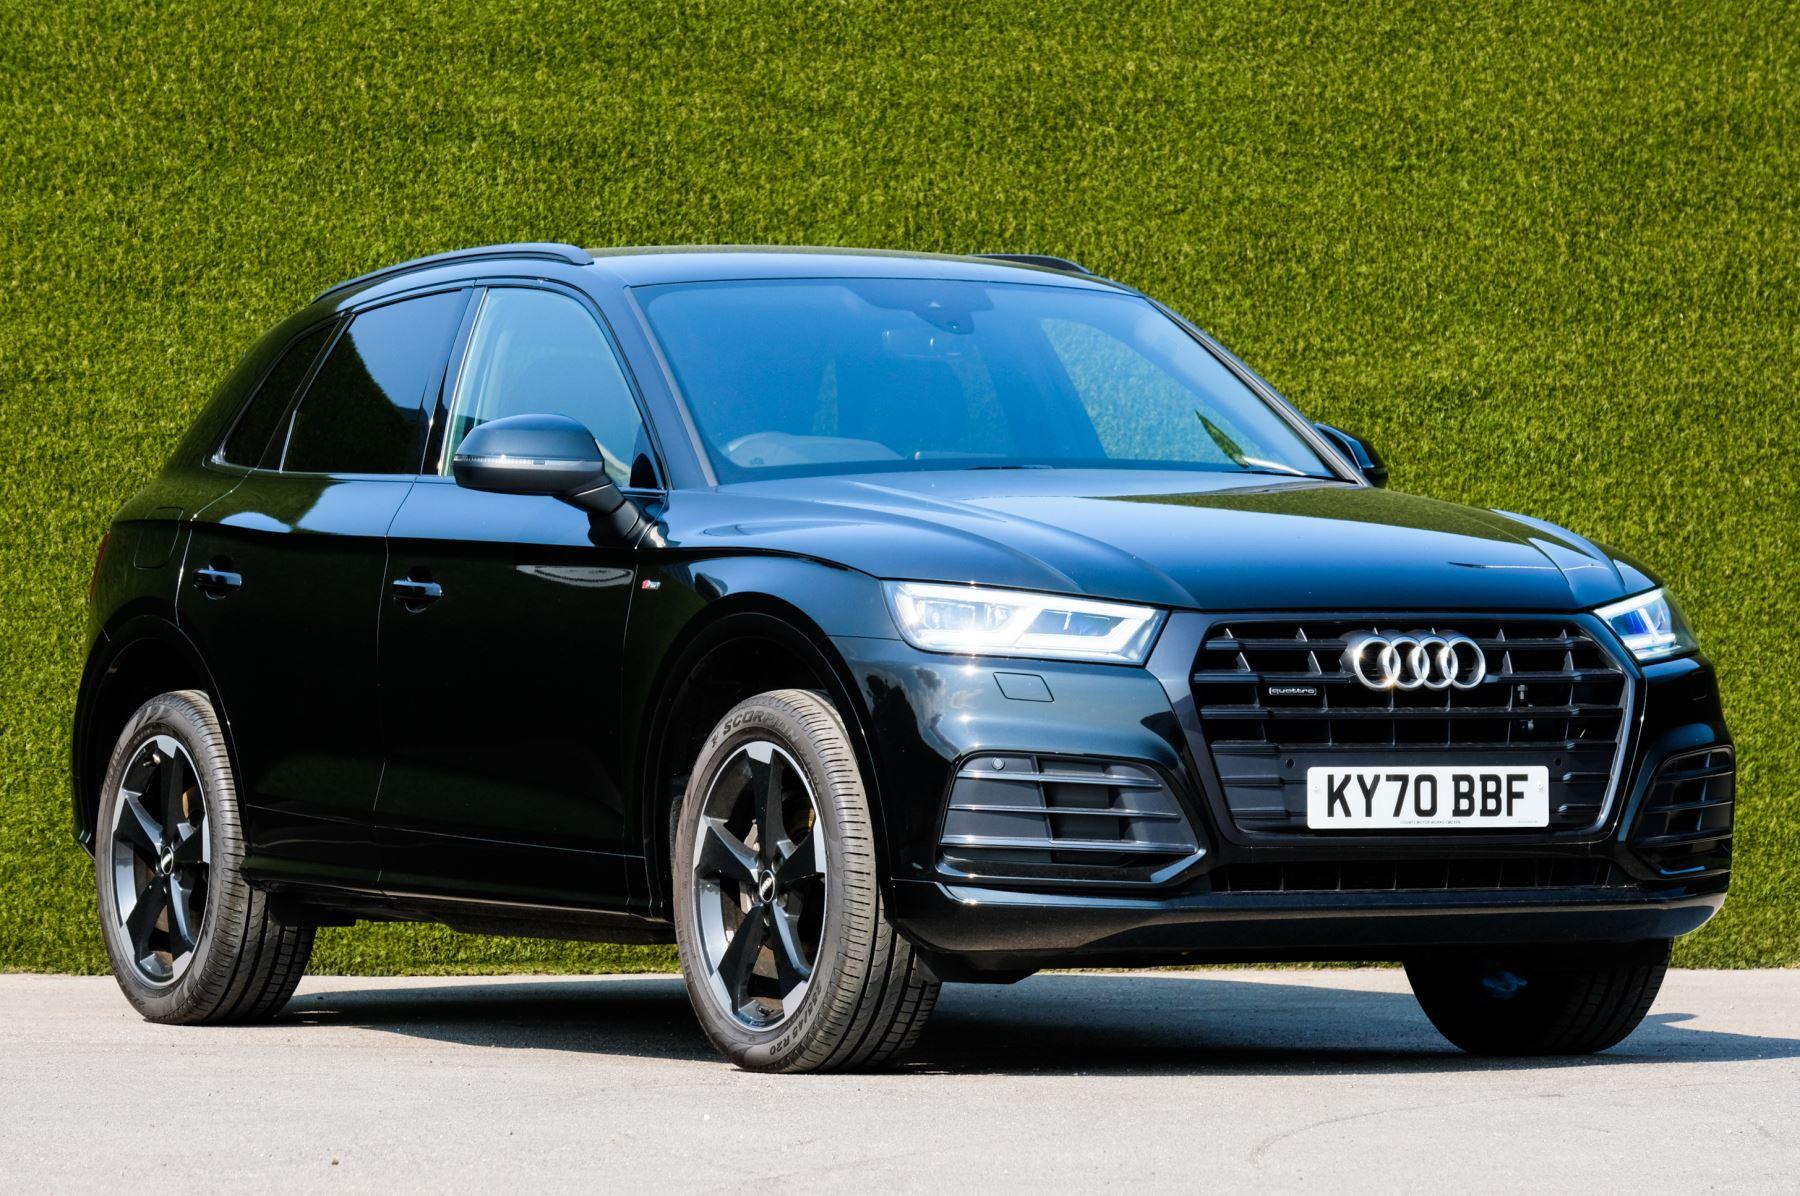 Audi Q5 40 TDI Quattro Black Edition 5dr S Tronic - Tech Pack 2.0 Diesel Automatic Estate (2020) image